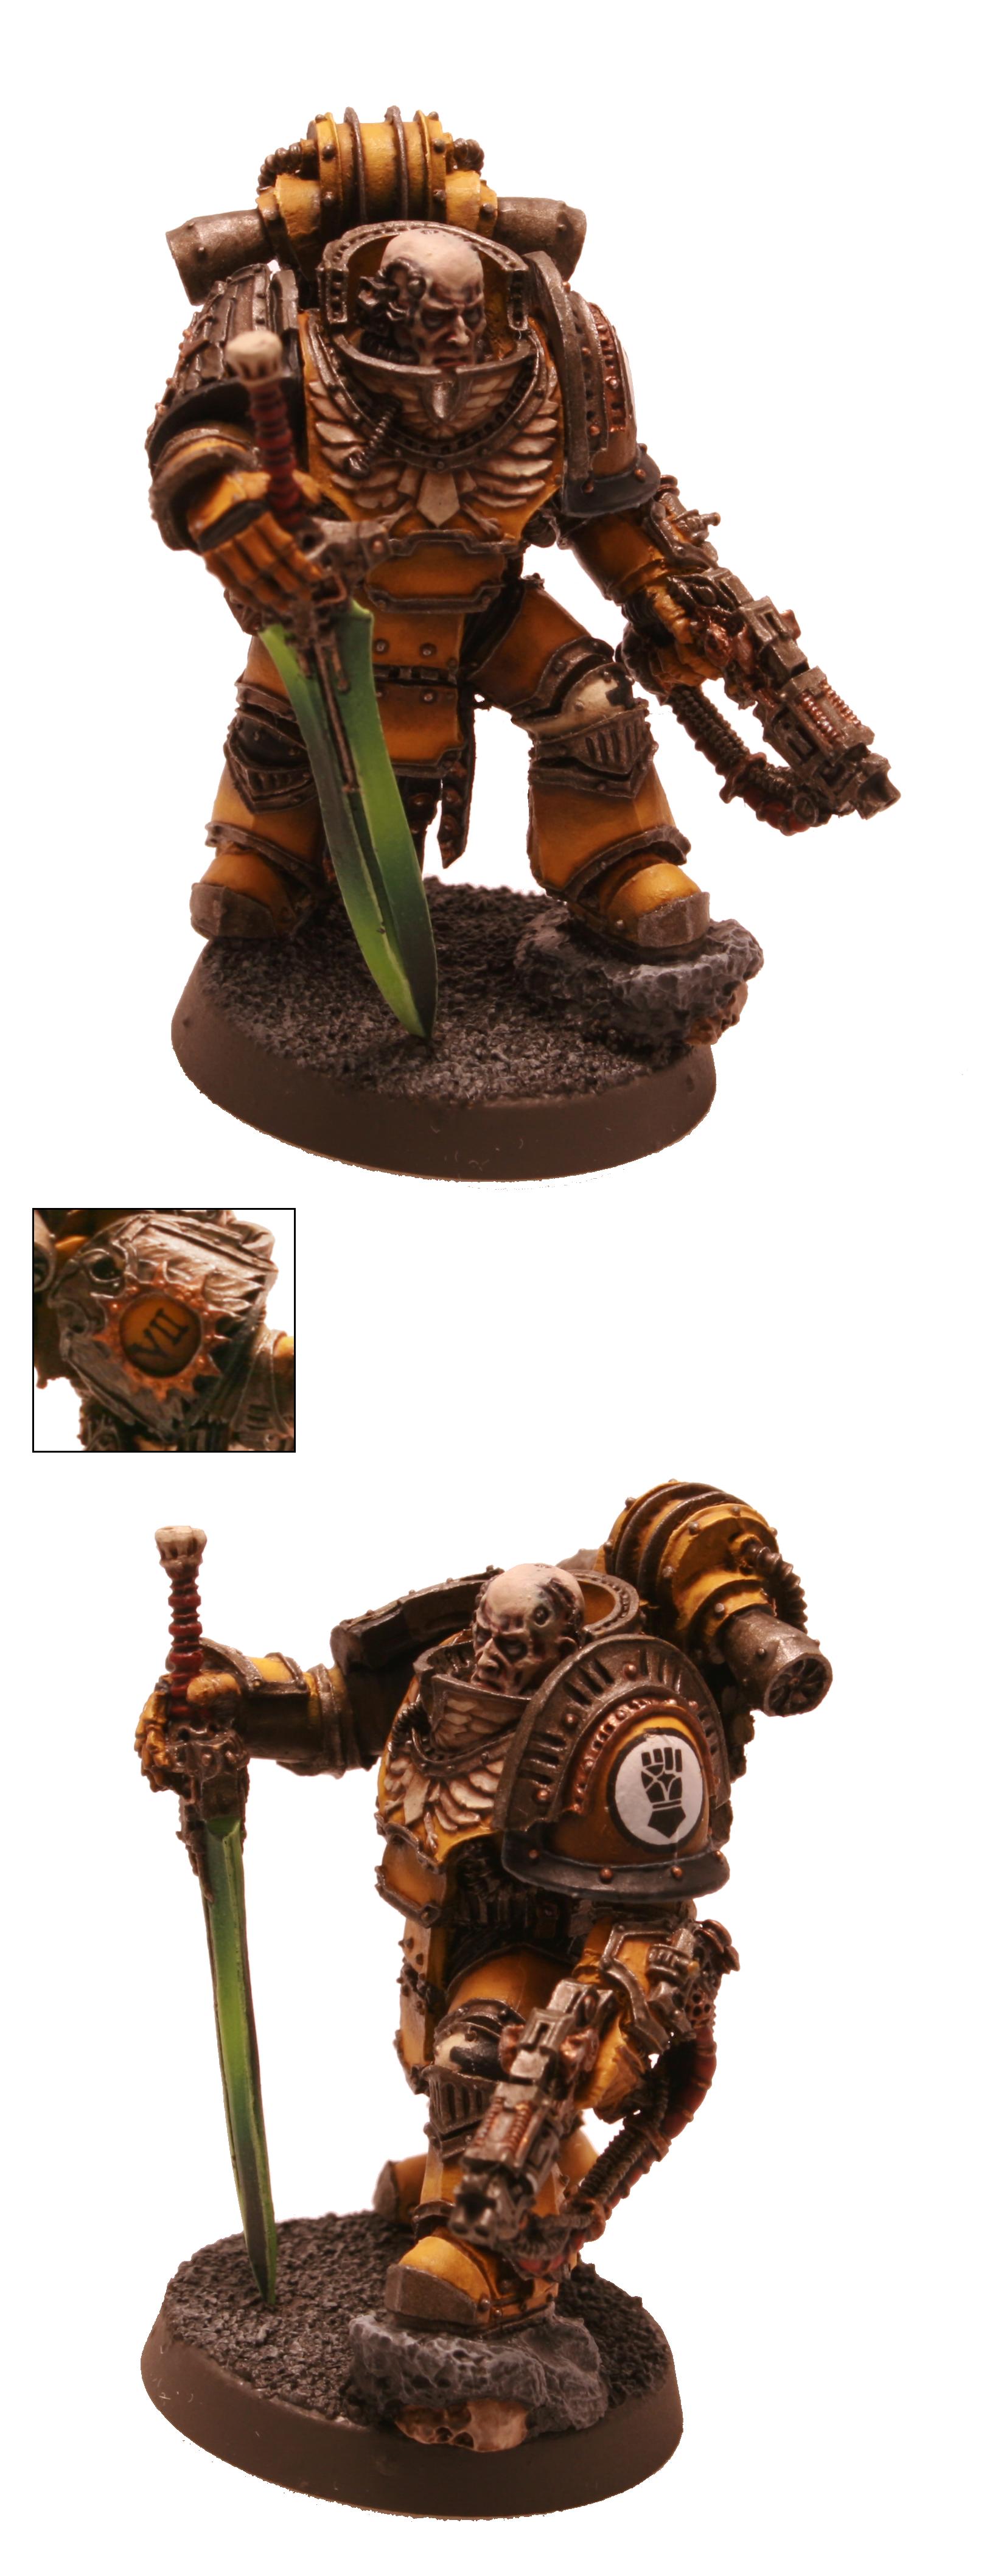 Forge World, Imperial Fists, Praetor, Warhammer 40,000